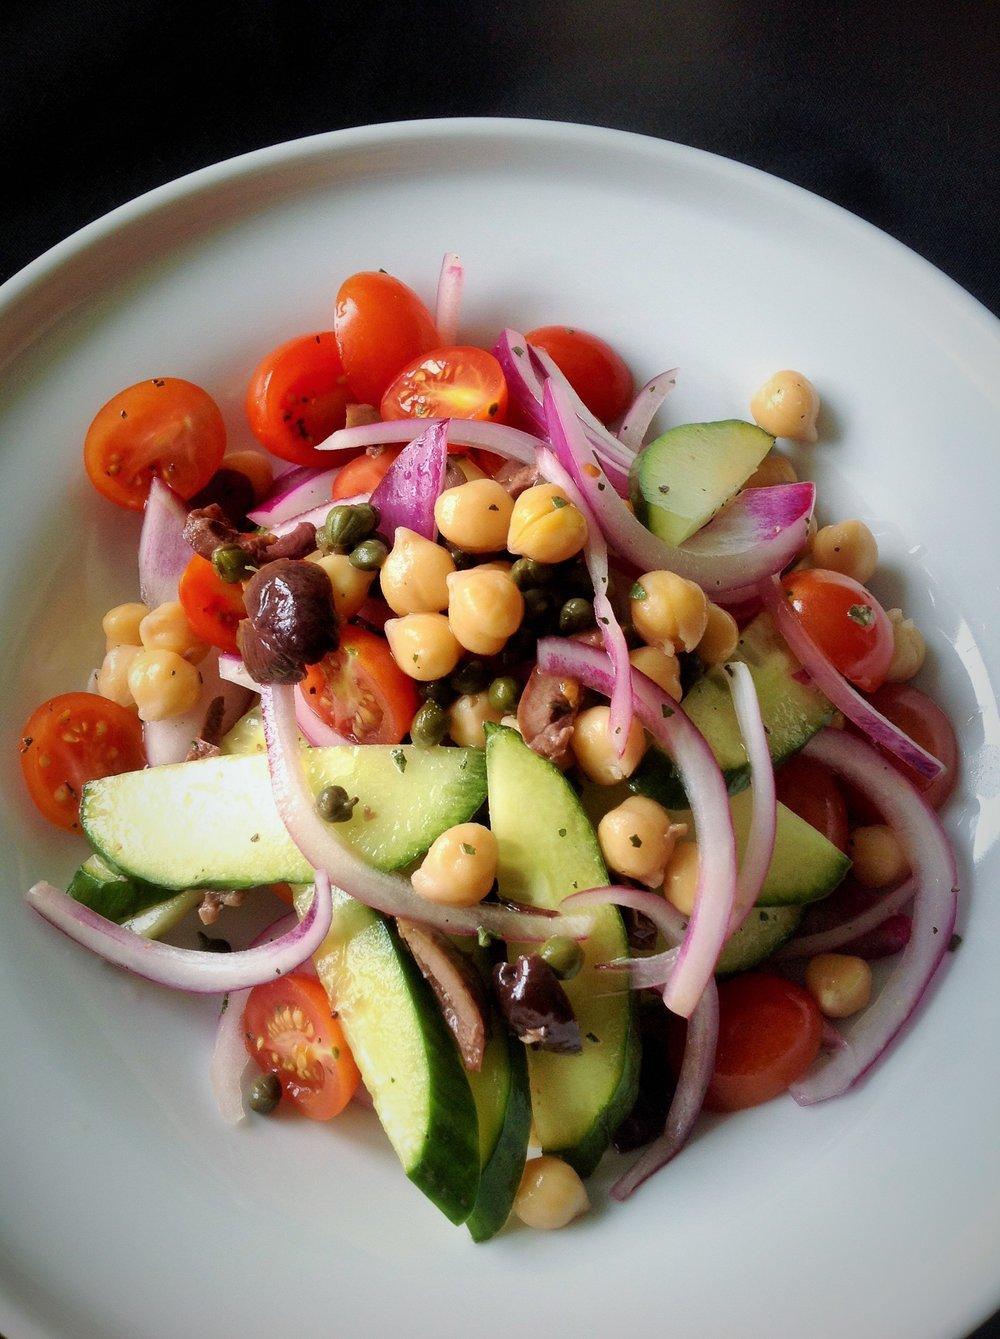 Big 'Ole Italian Chickpea Salad - Healthy, Gluten-Free, Grain-Free, Oil-Free, Bean, Olive, Caper, Plant-Based, Vegan Recipe